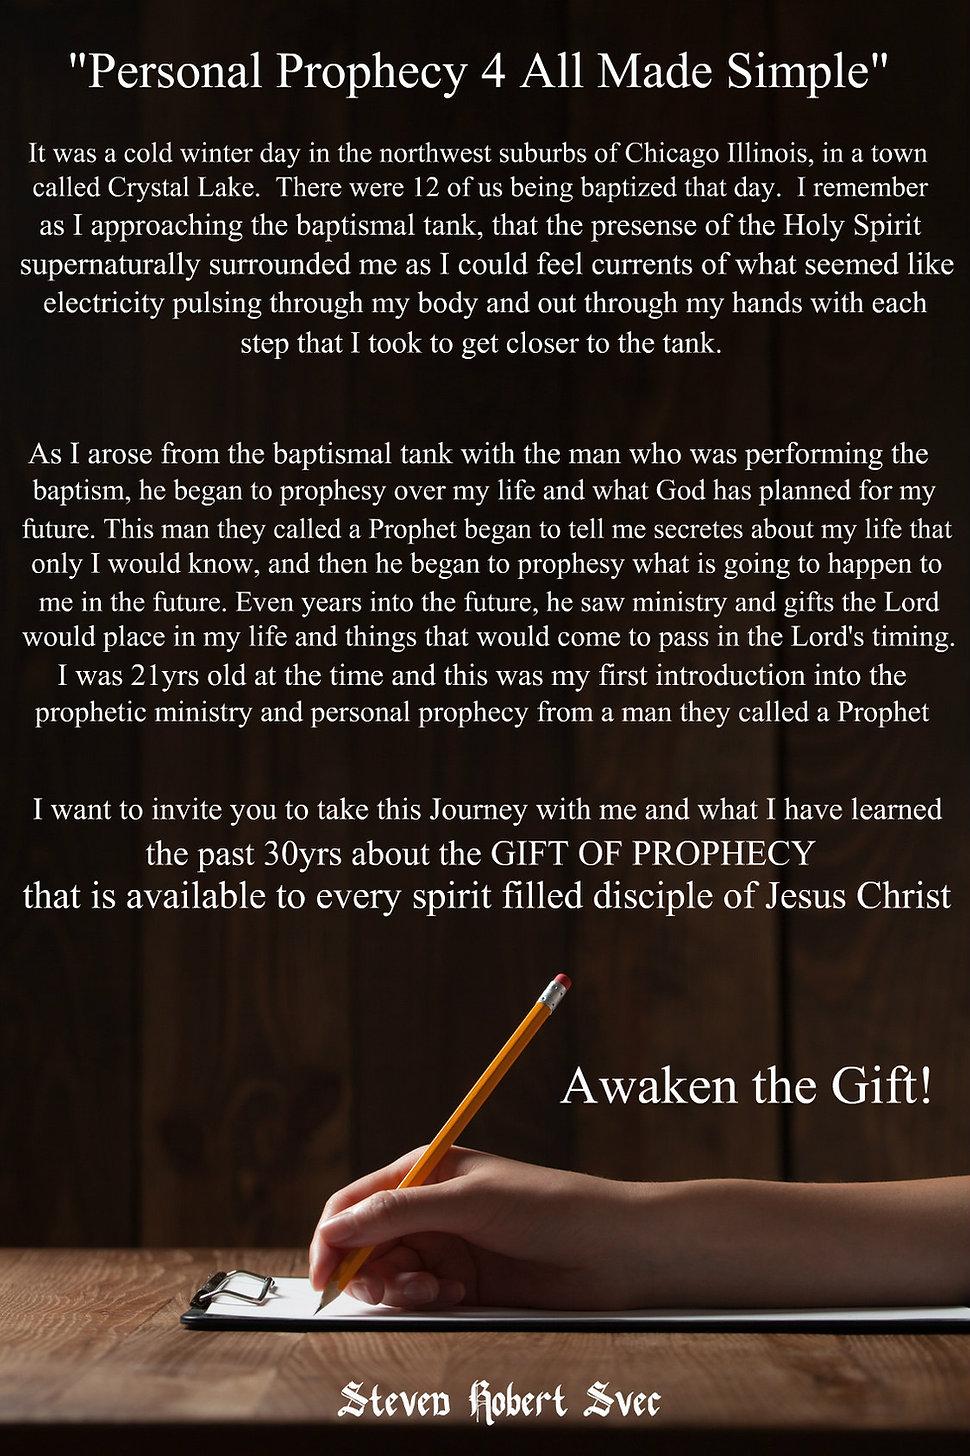 Awaken the Gift of Personal Prophecy Steven Svec